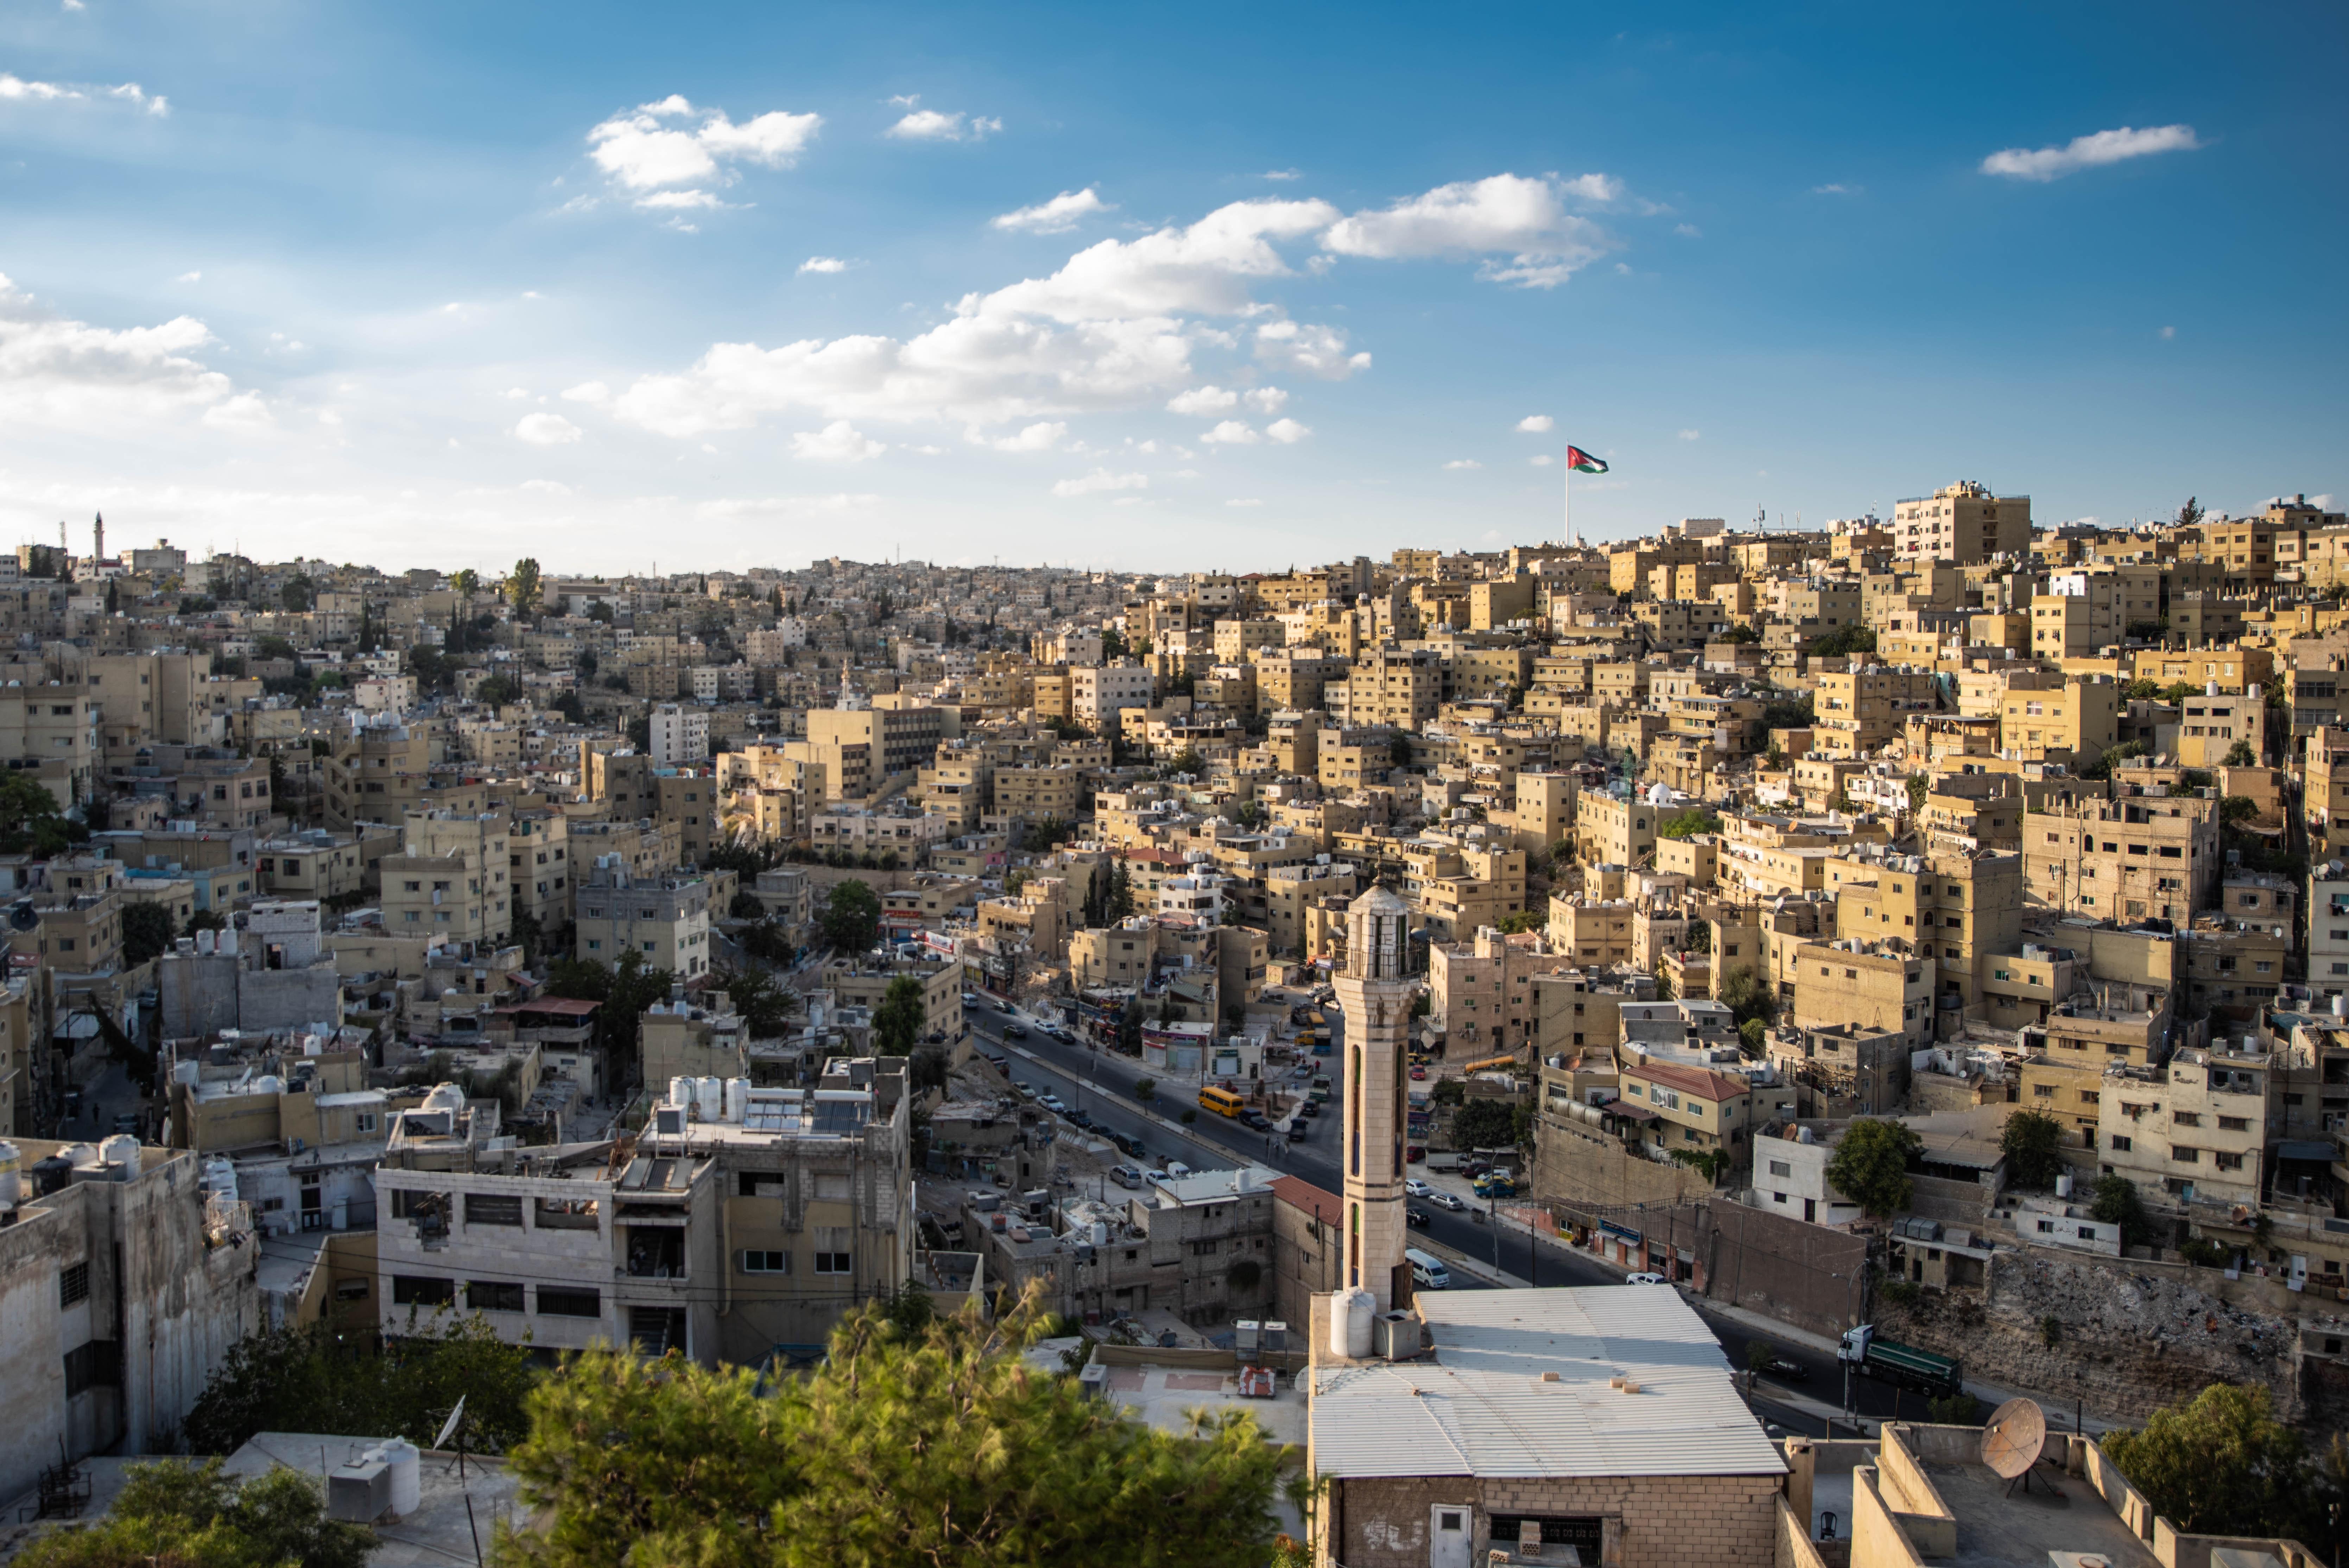 d819fcbb47a1 aerial shot amman buildings city cityscape flag jordan skyline town urban